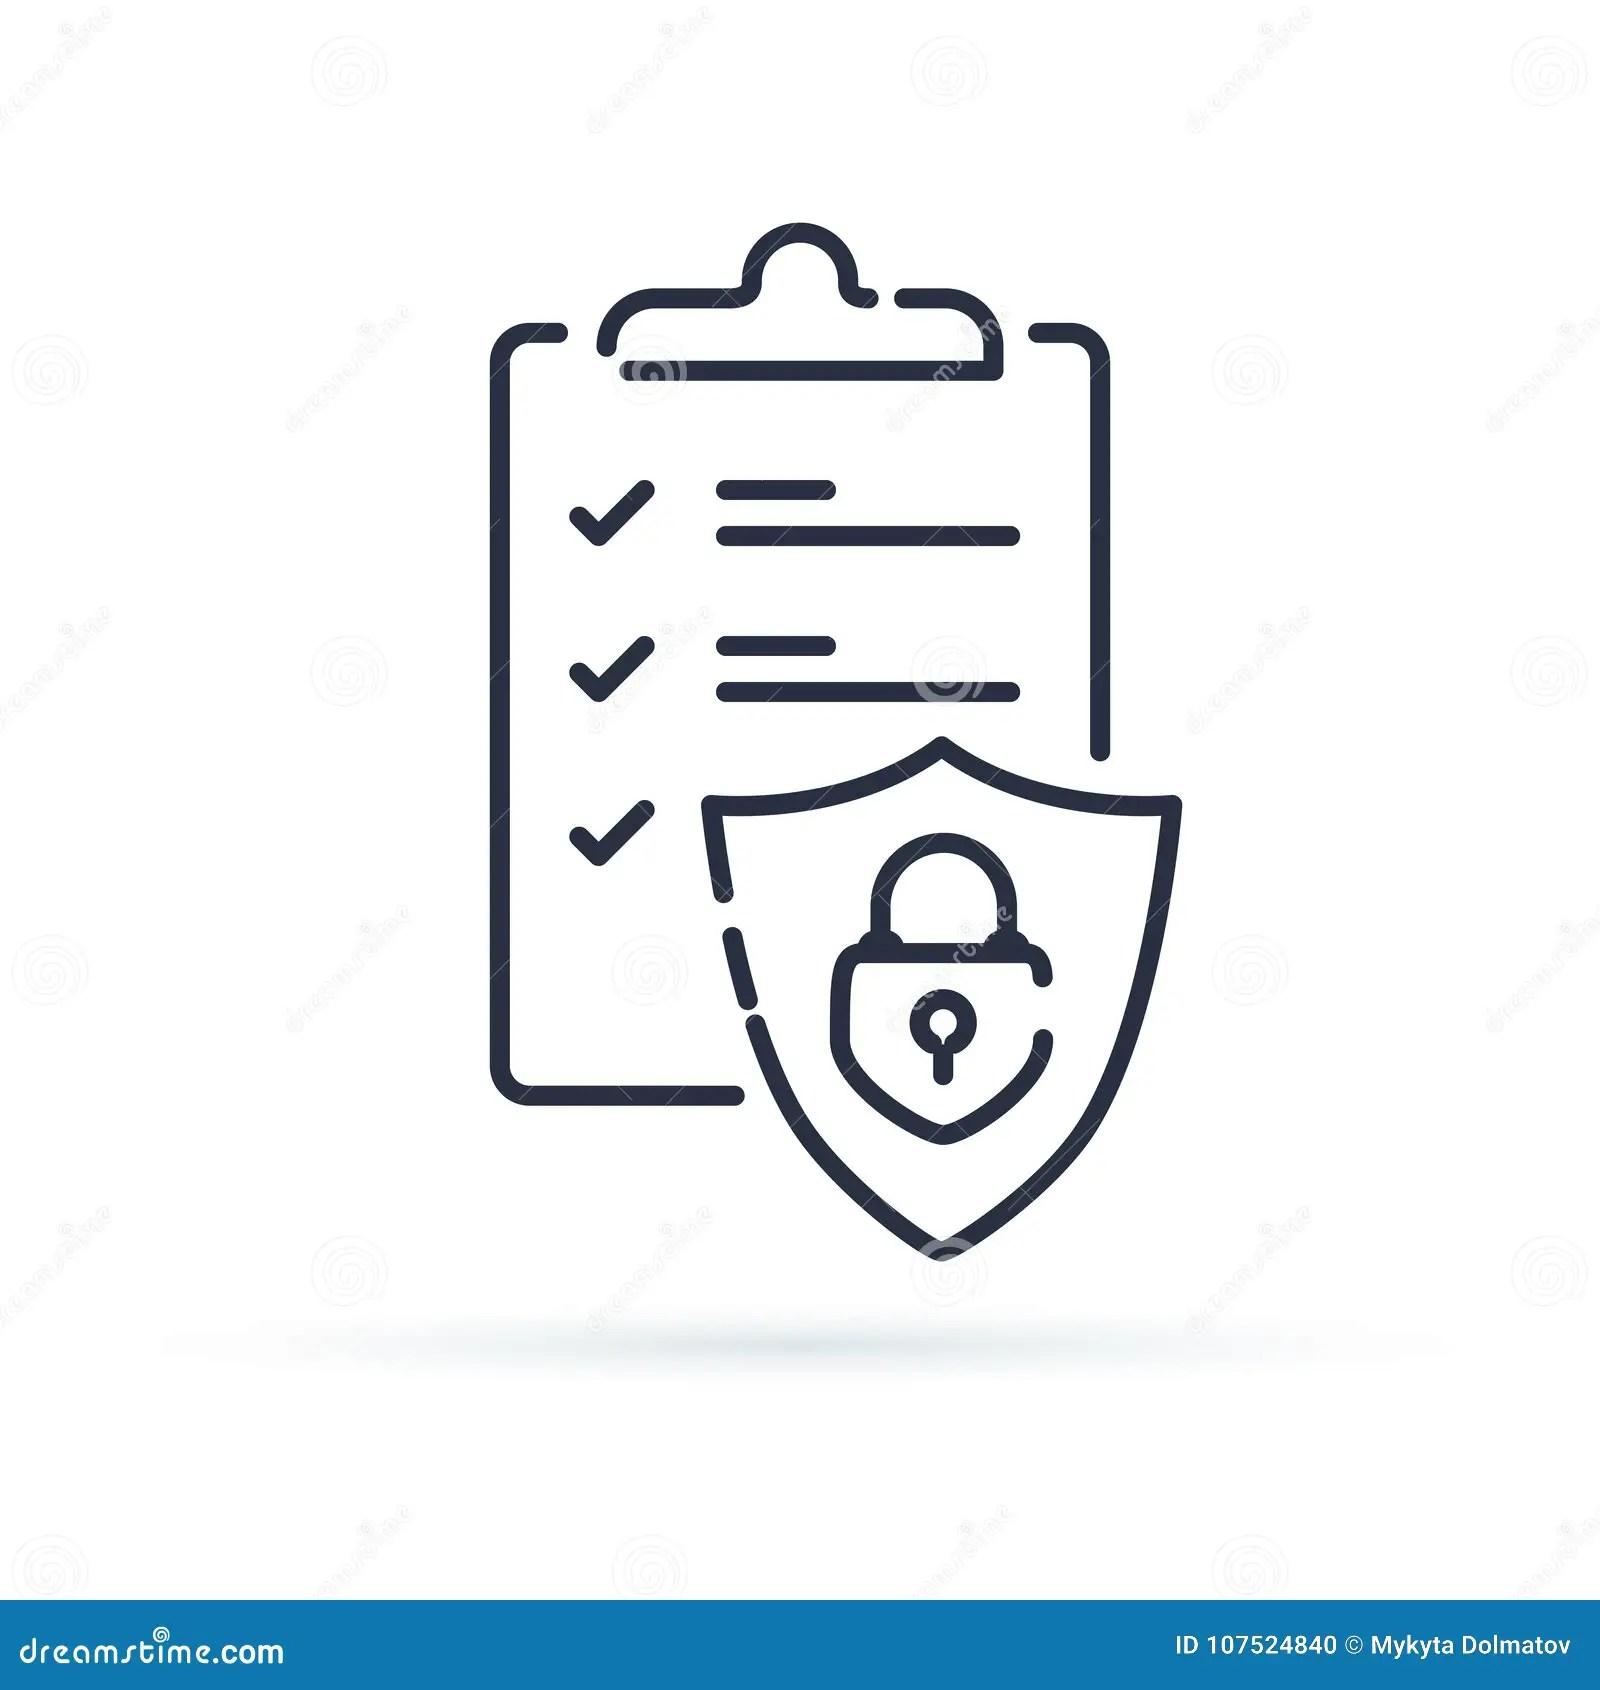 Insurance Policy Concept, Check Board And Shield, Data